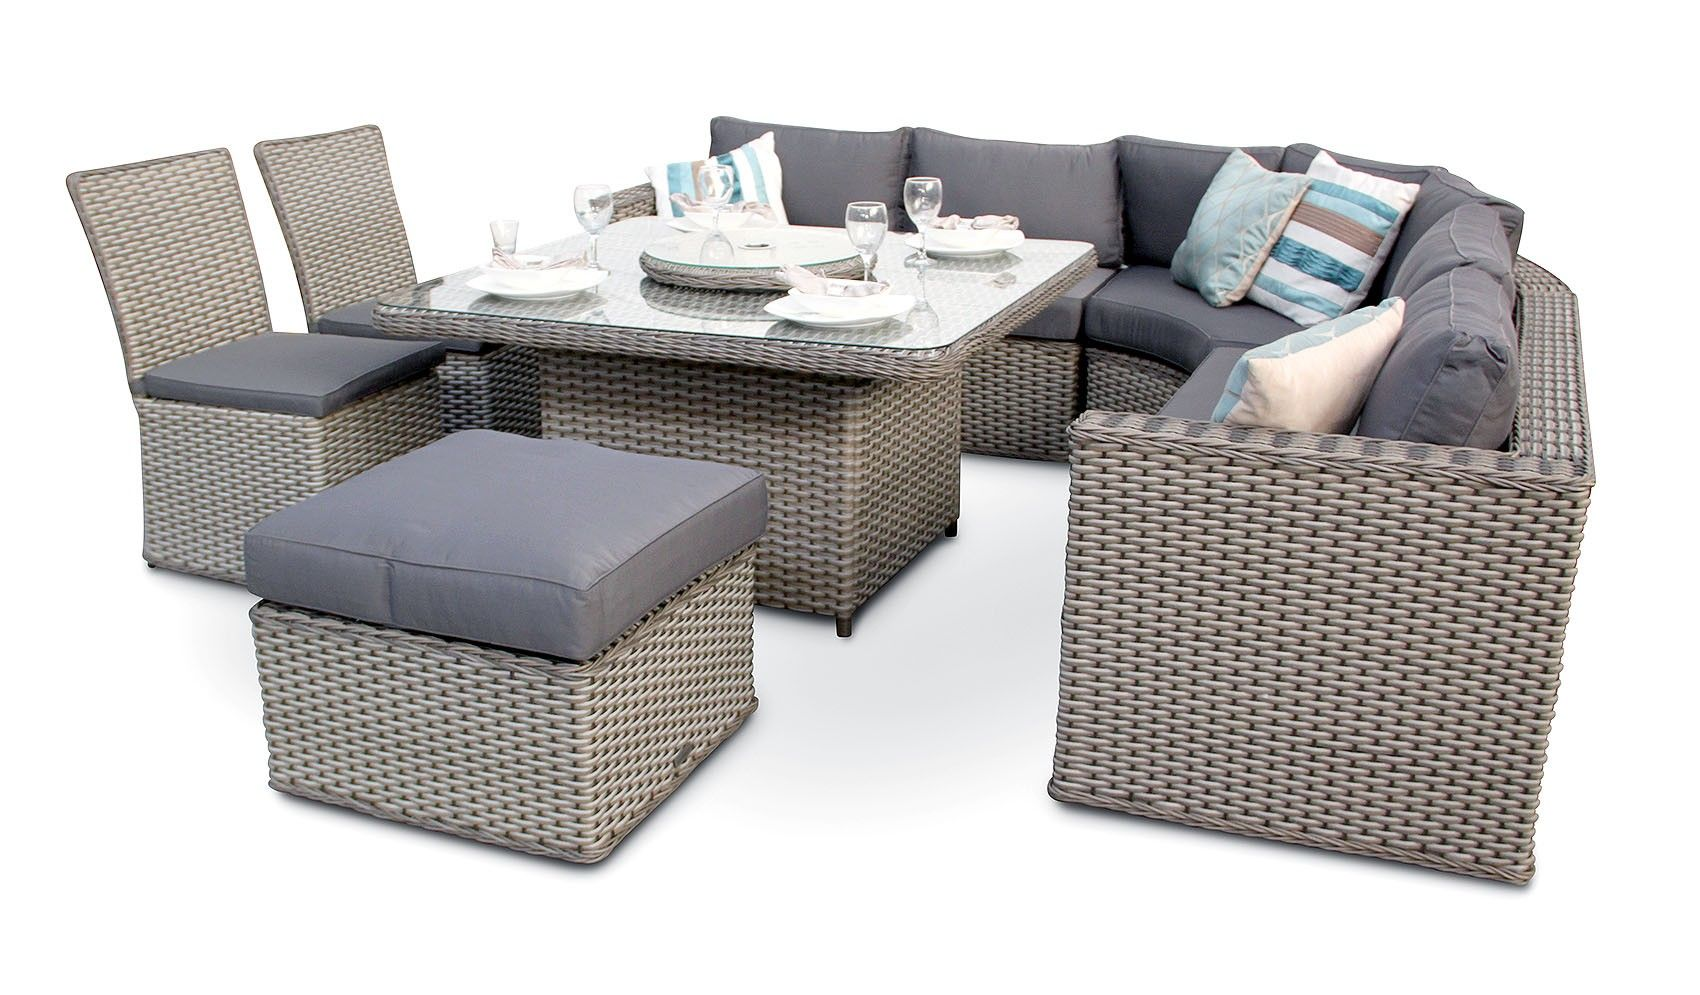 6pc milan modular rattan corner sofa set outdoor furniture cover brantwood 8pc round back dining with chairs whitewash grey